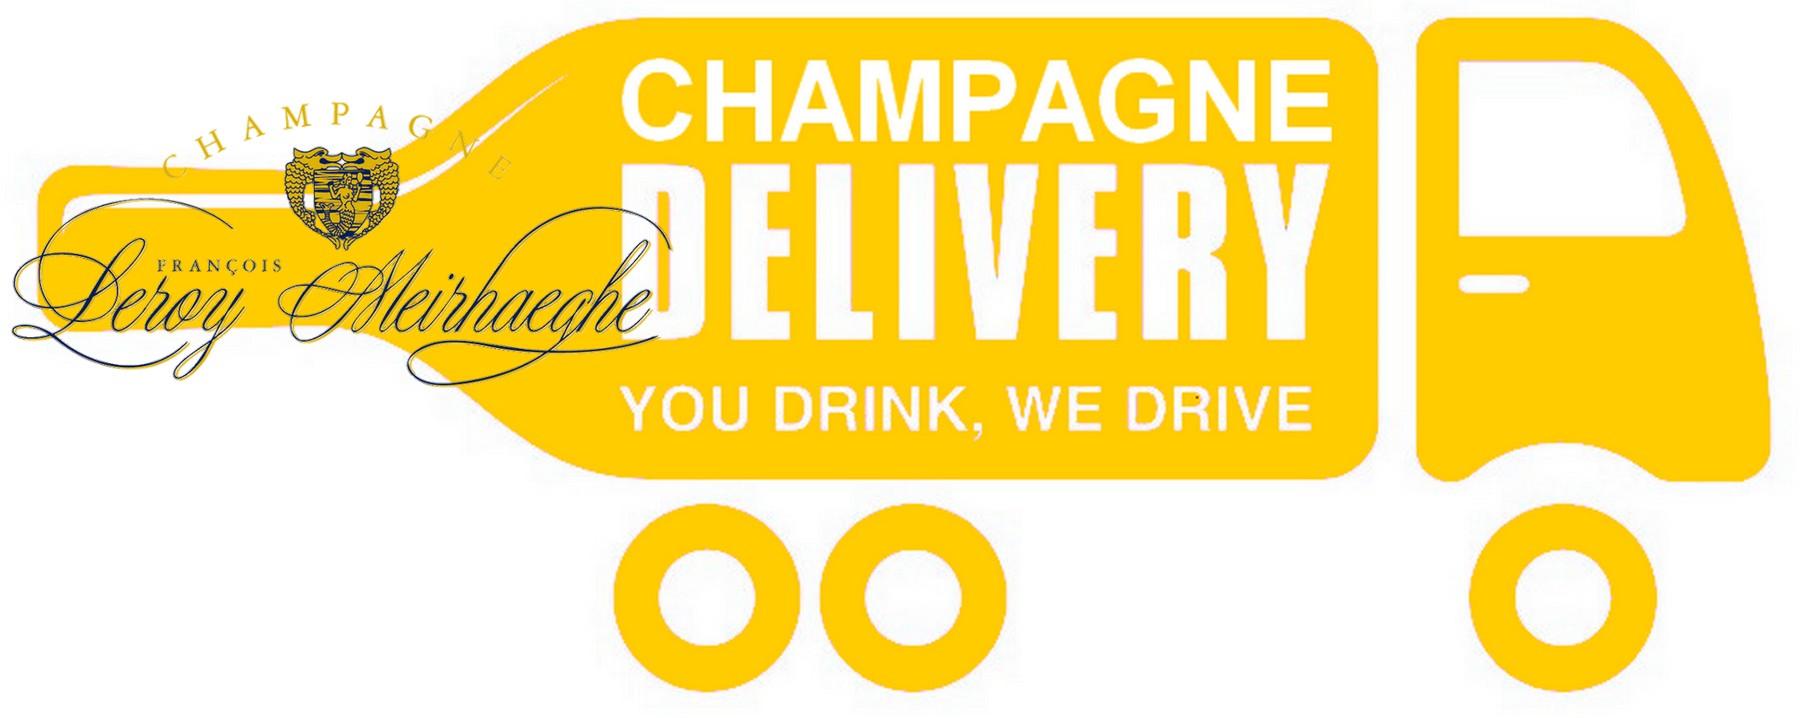 livraison-champagne-leroy-meirhaeghe